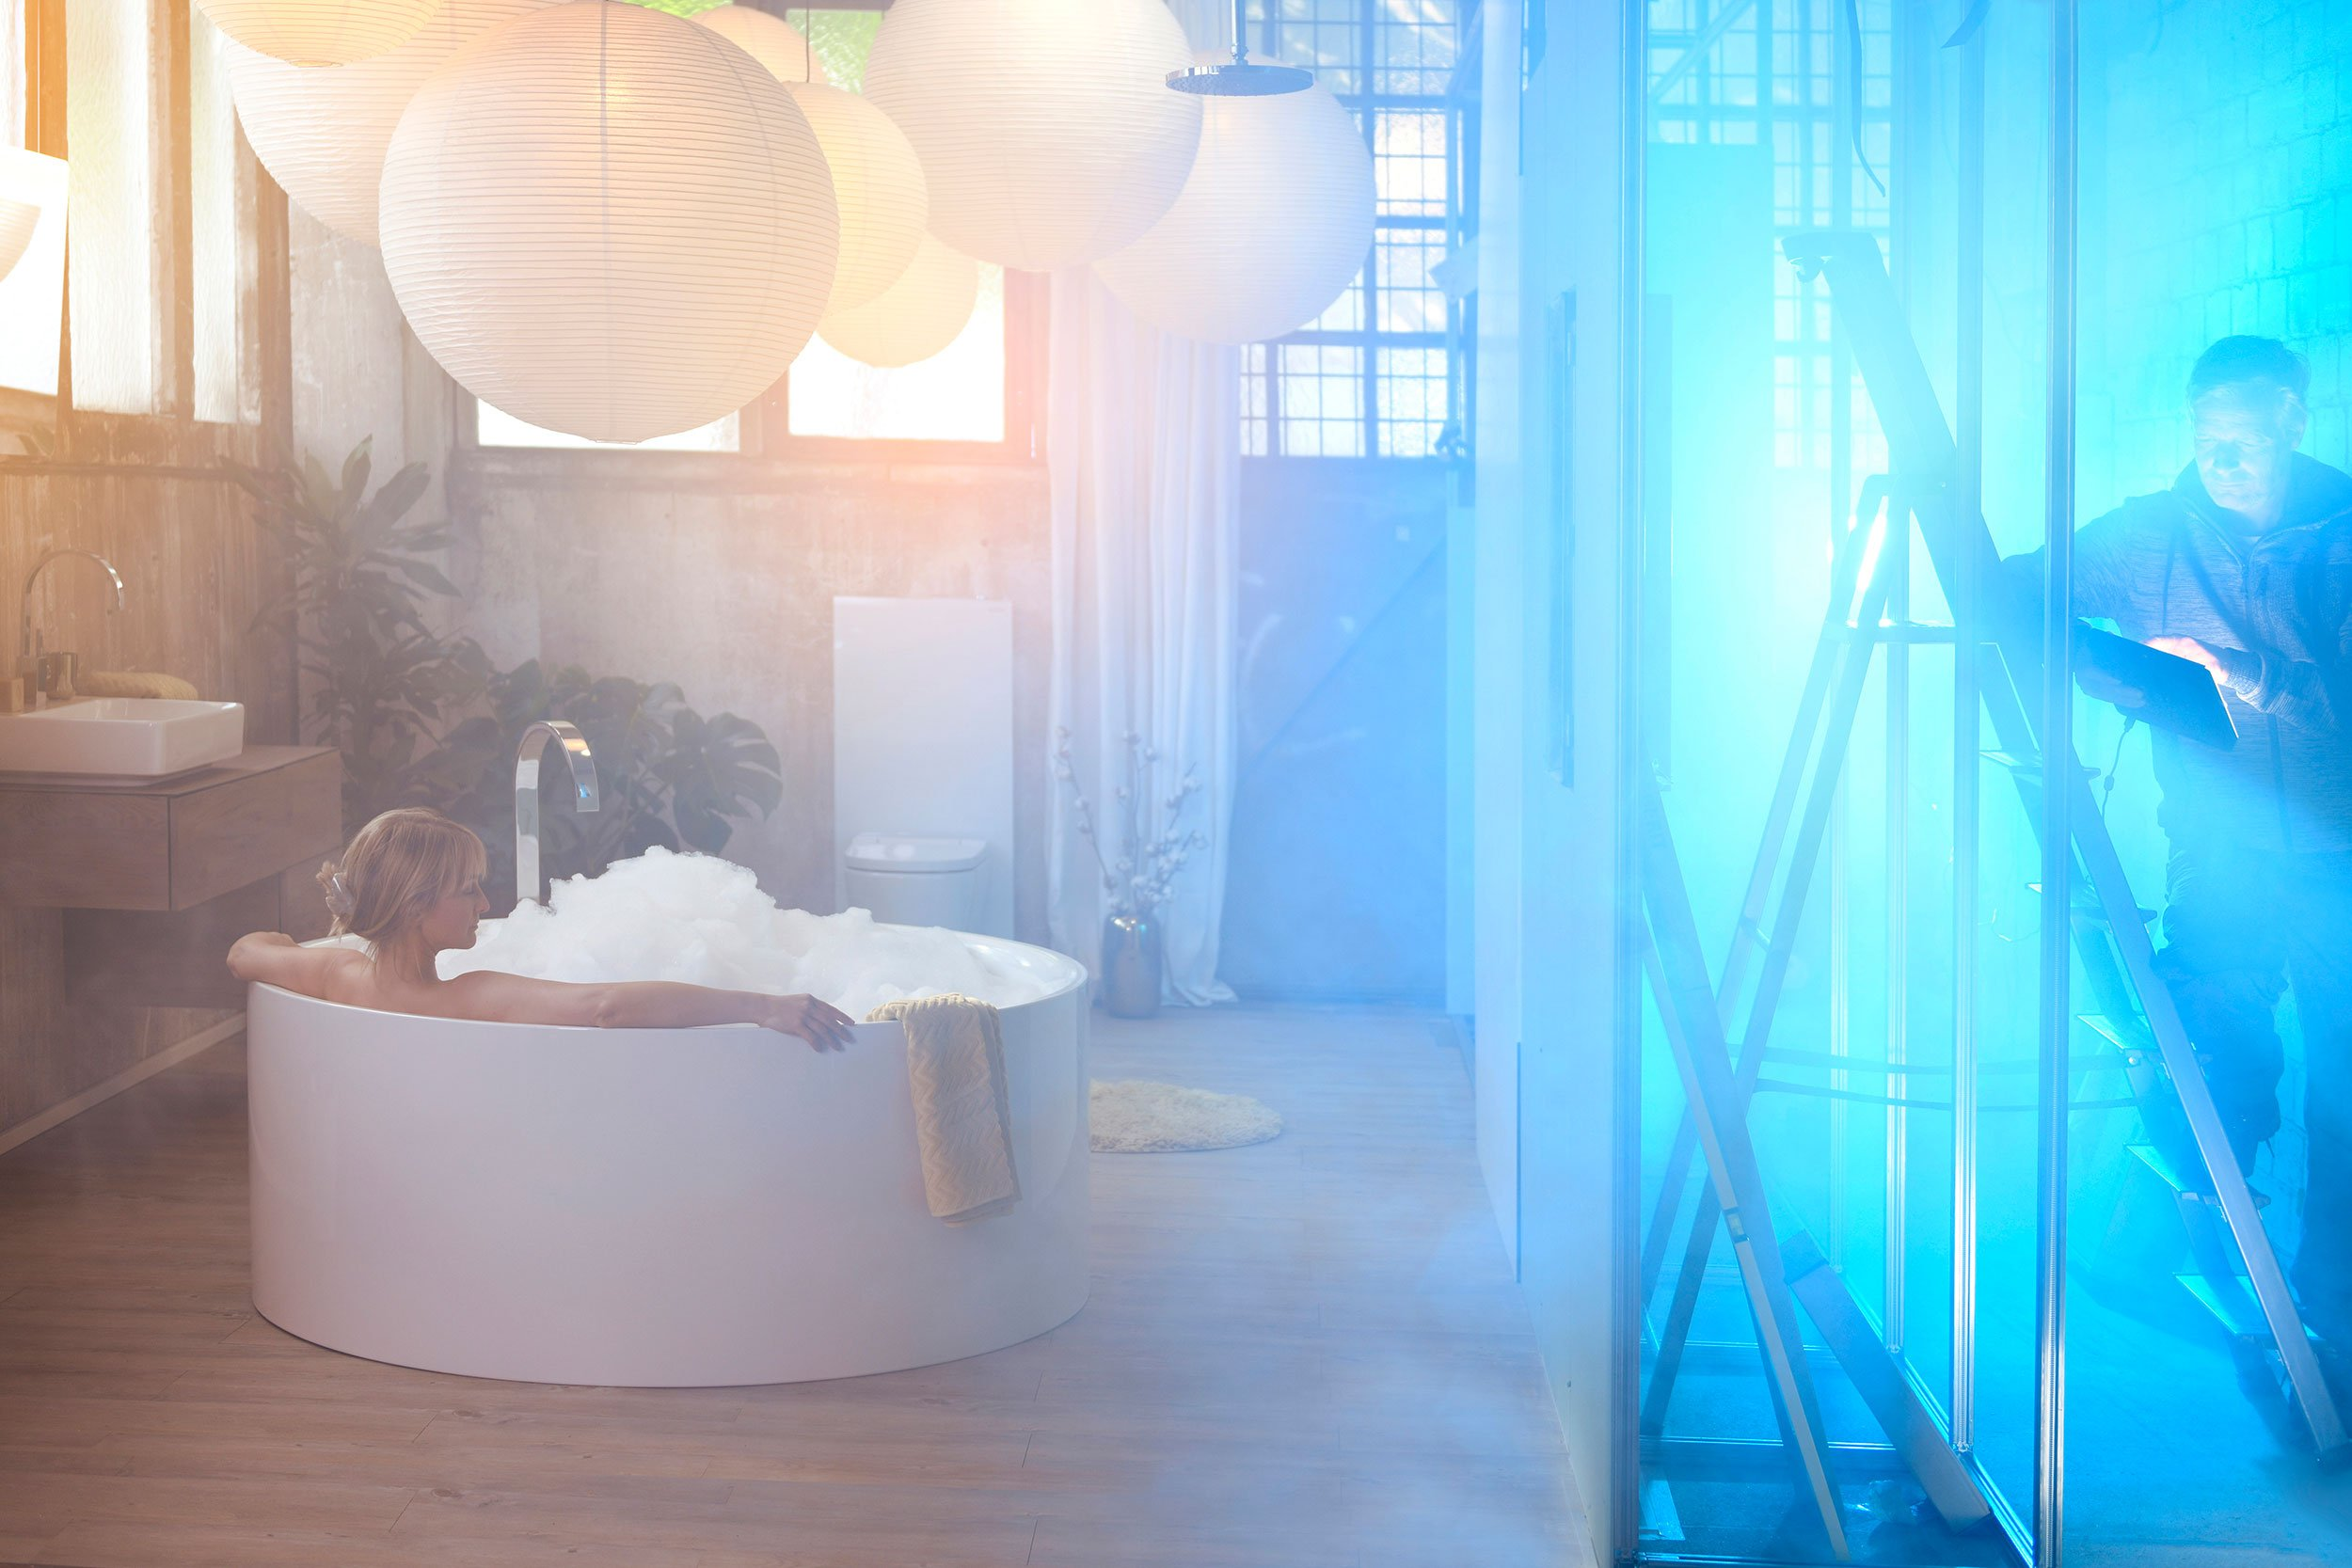 https://farconsulting.de/wp-content/uploads/2020/11/01a_Pop-up-my-Bathroom_Inside_Outside_ISH-2021-digital.jpg